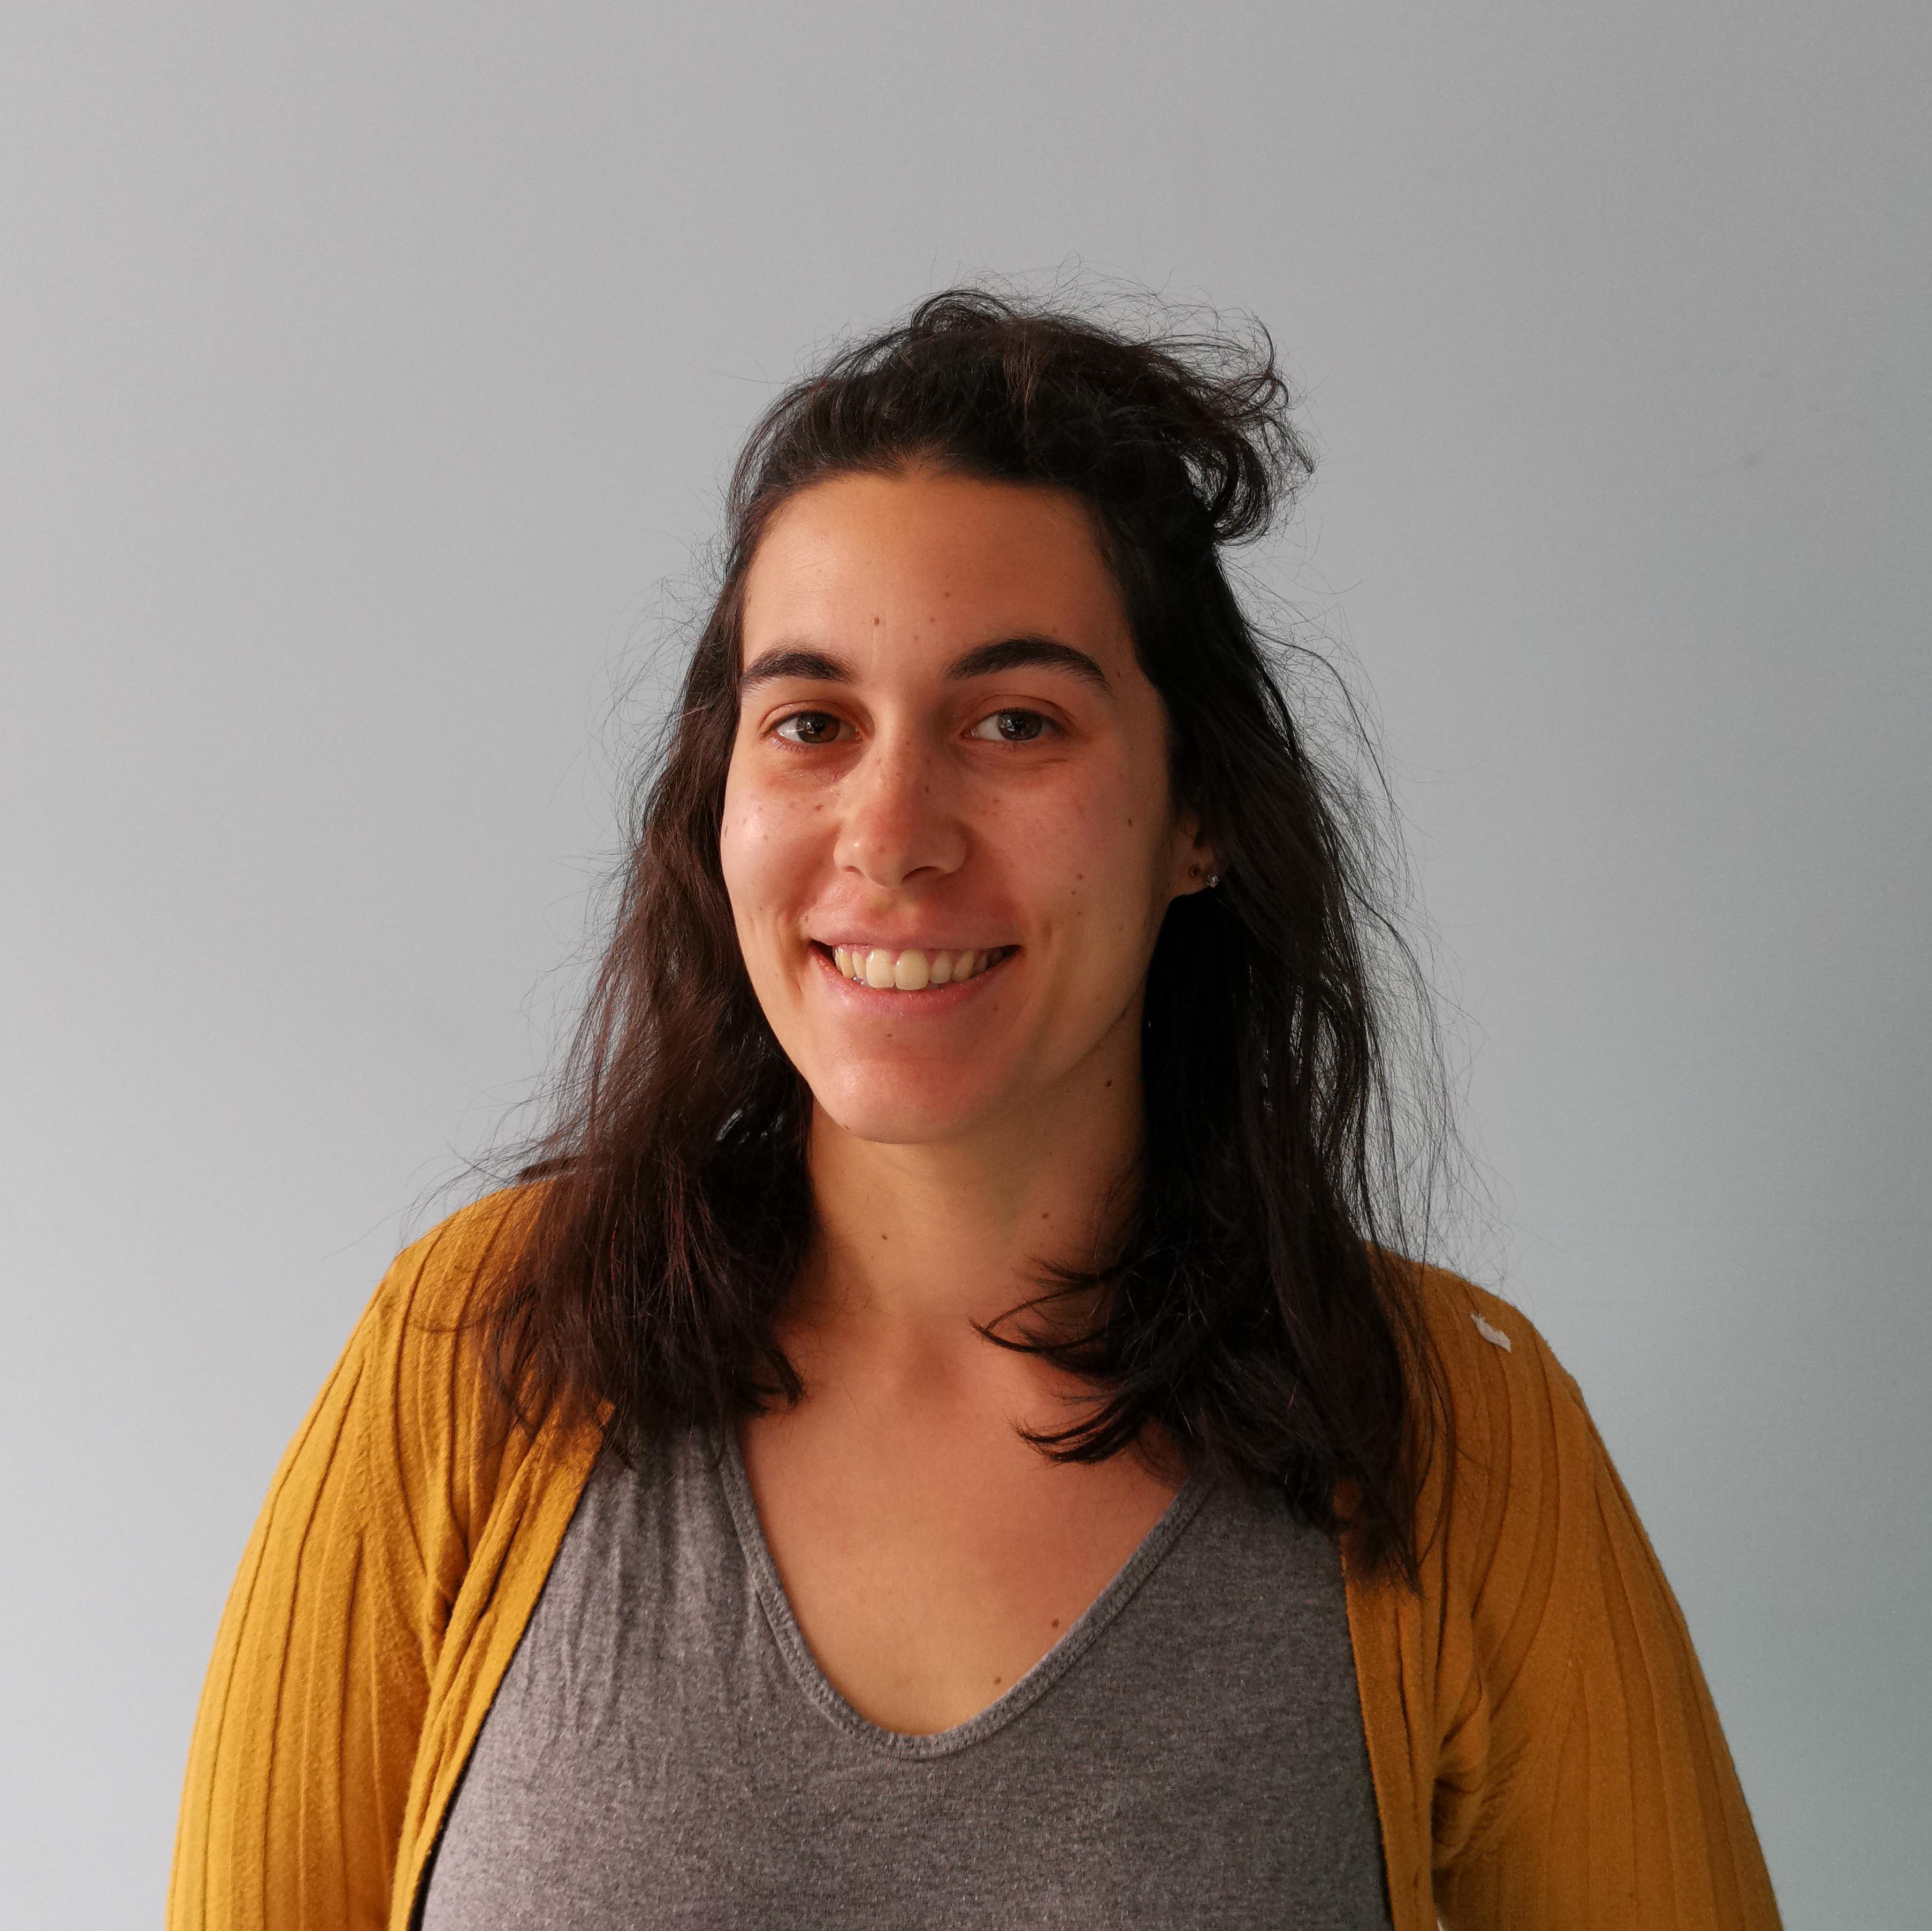 Audrey Sarrazin